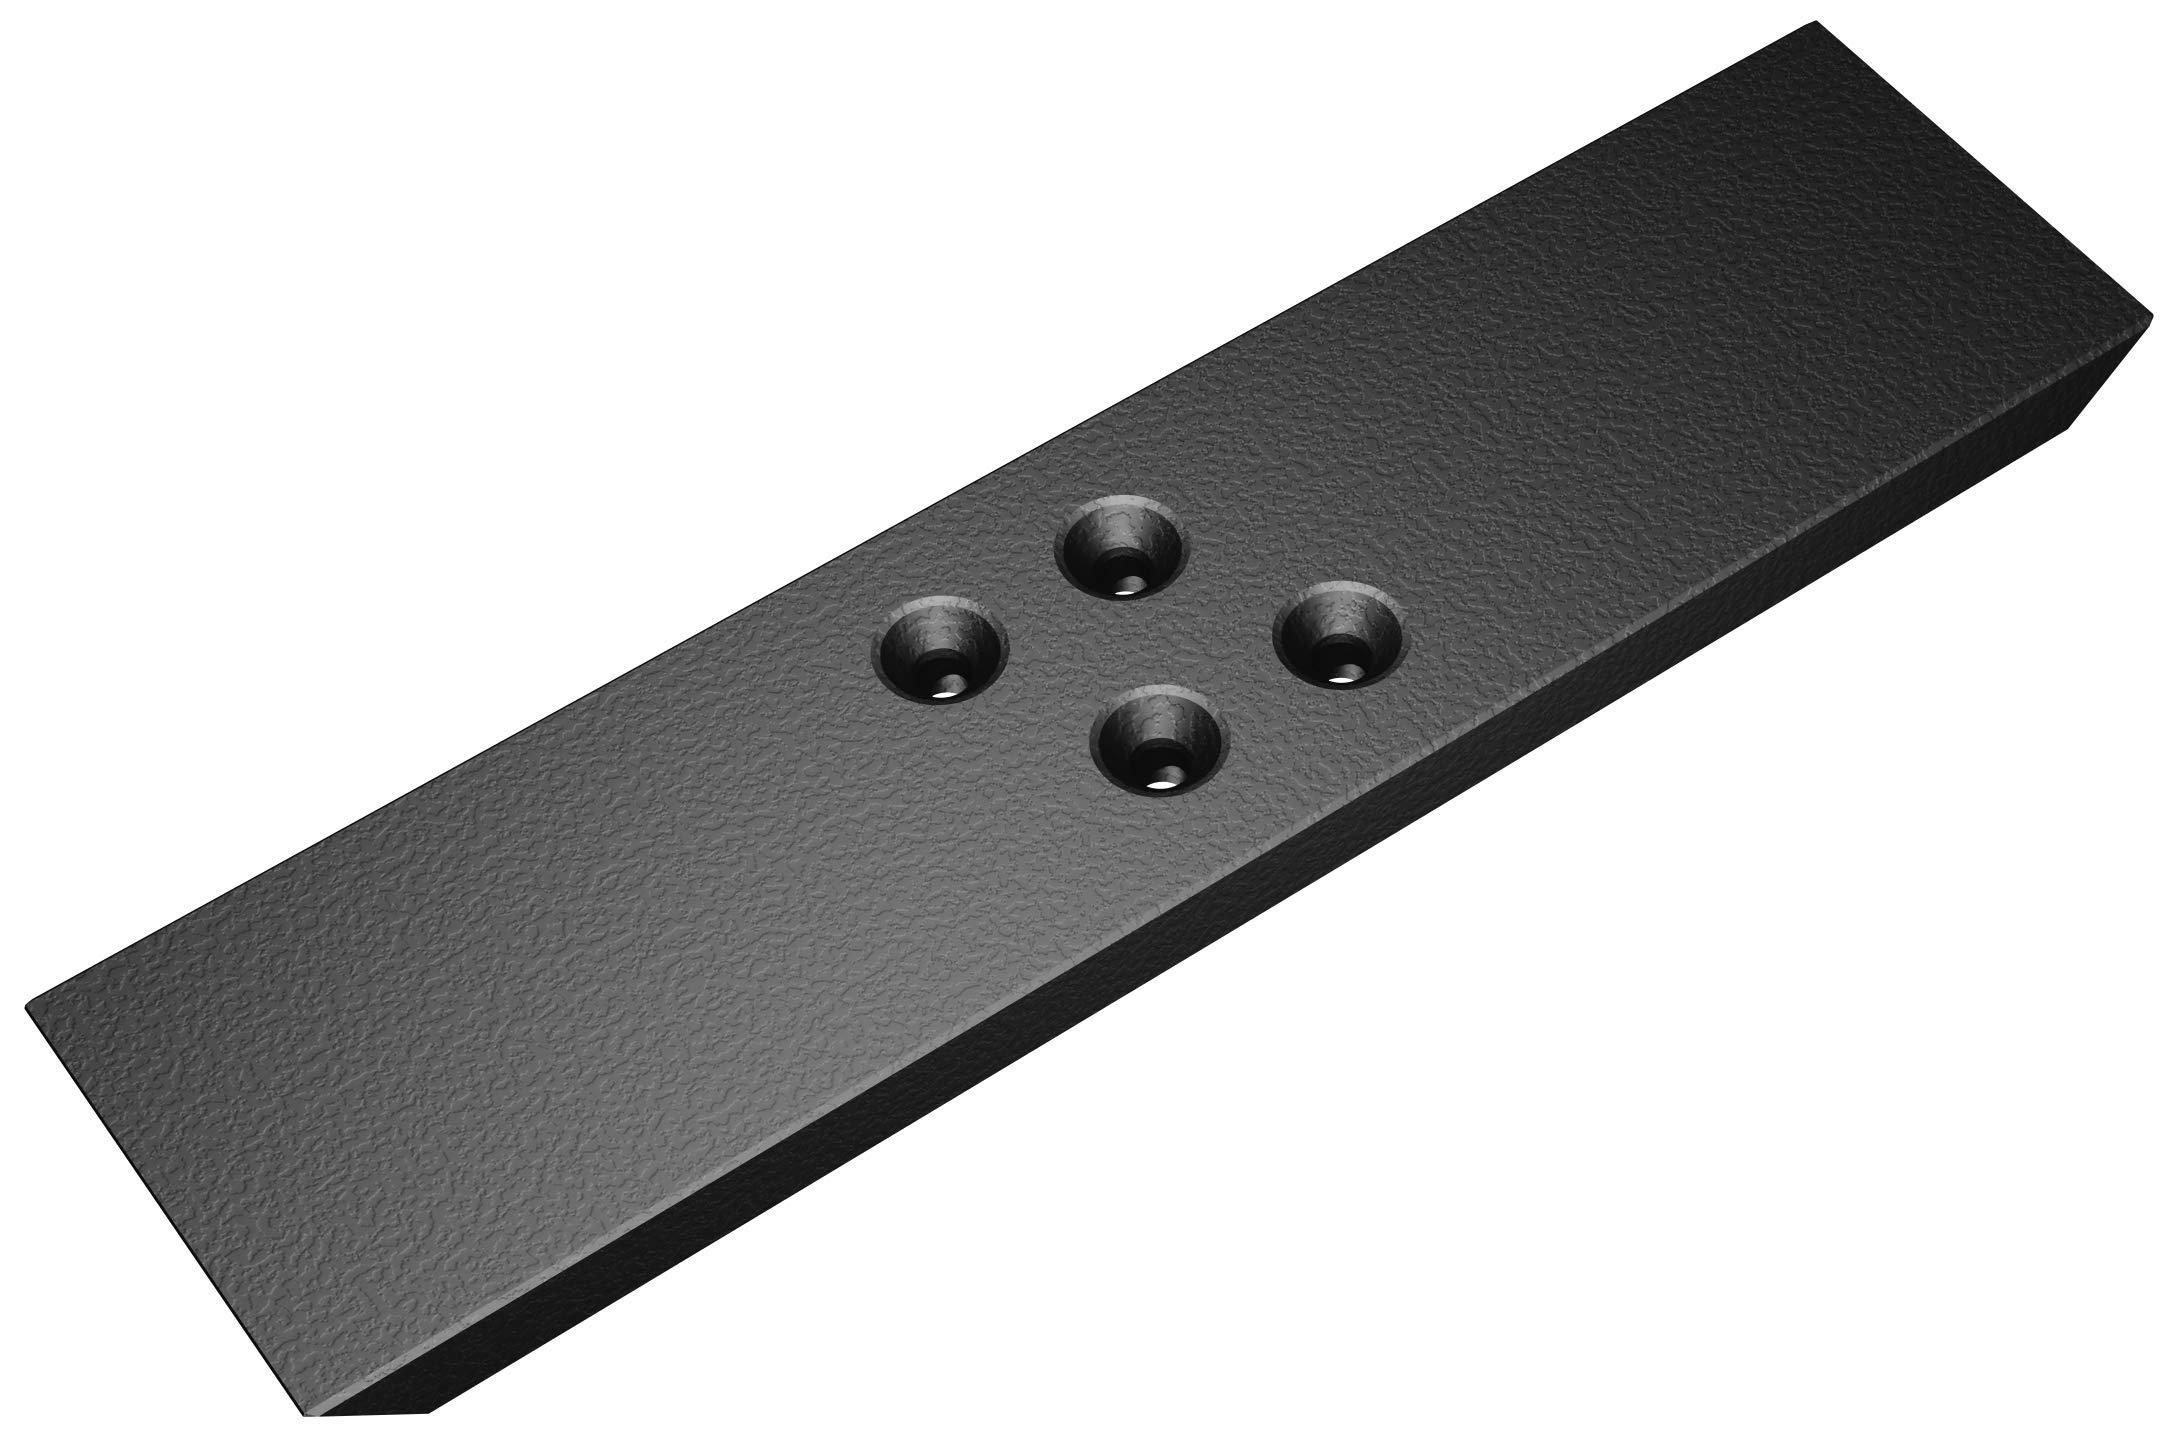 Flat Wall Countertop Support Bracket (22 inch)